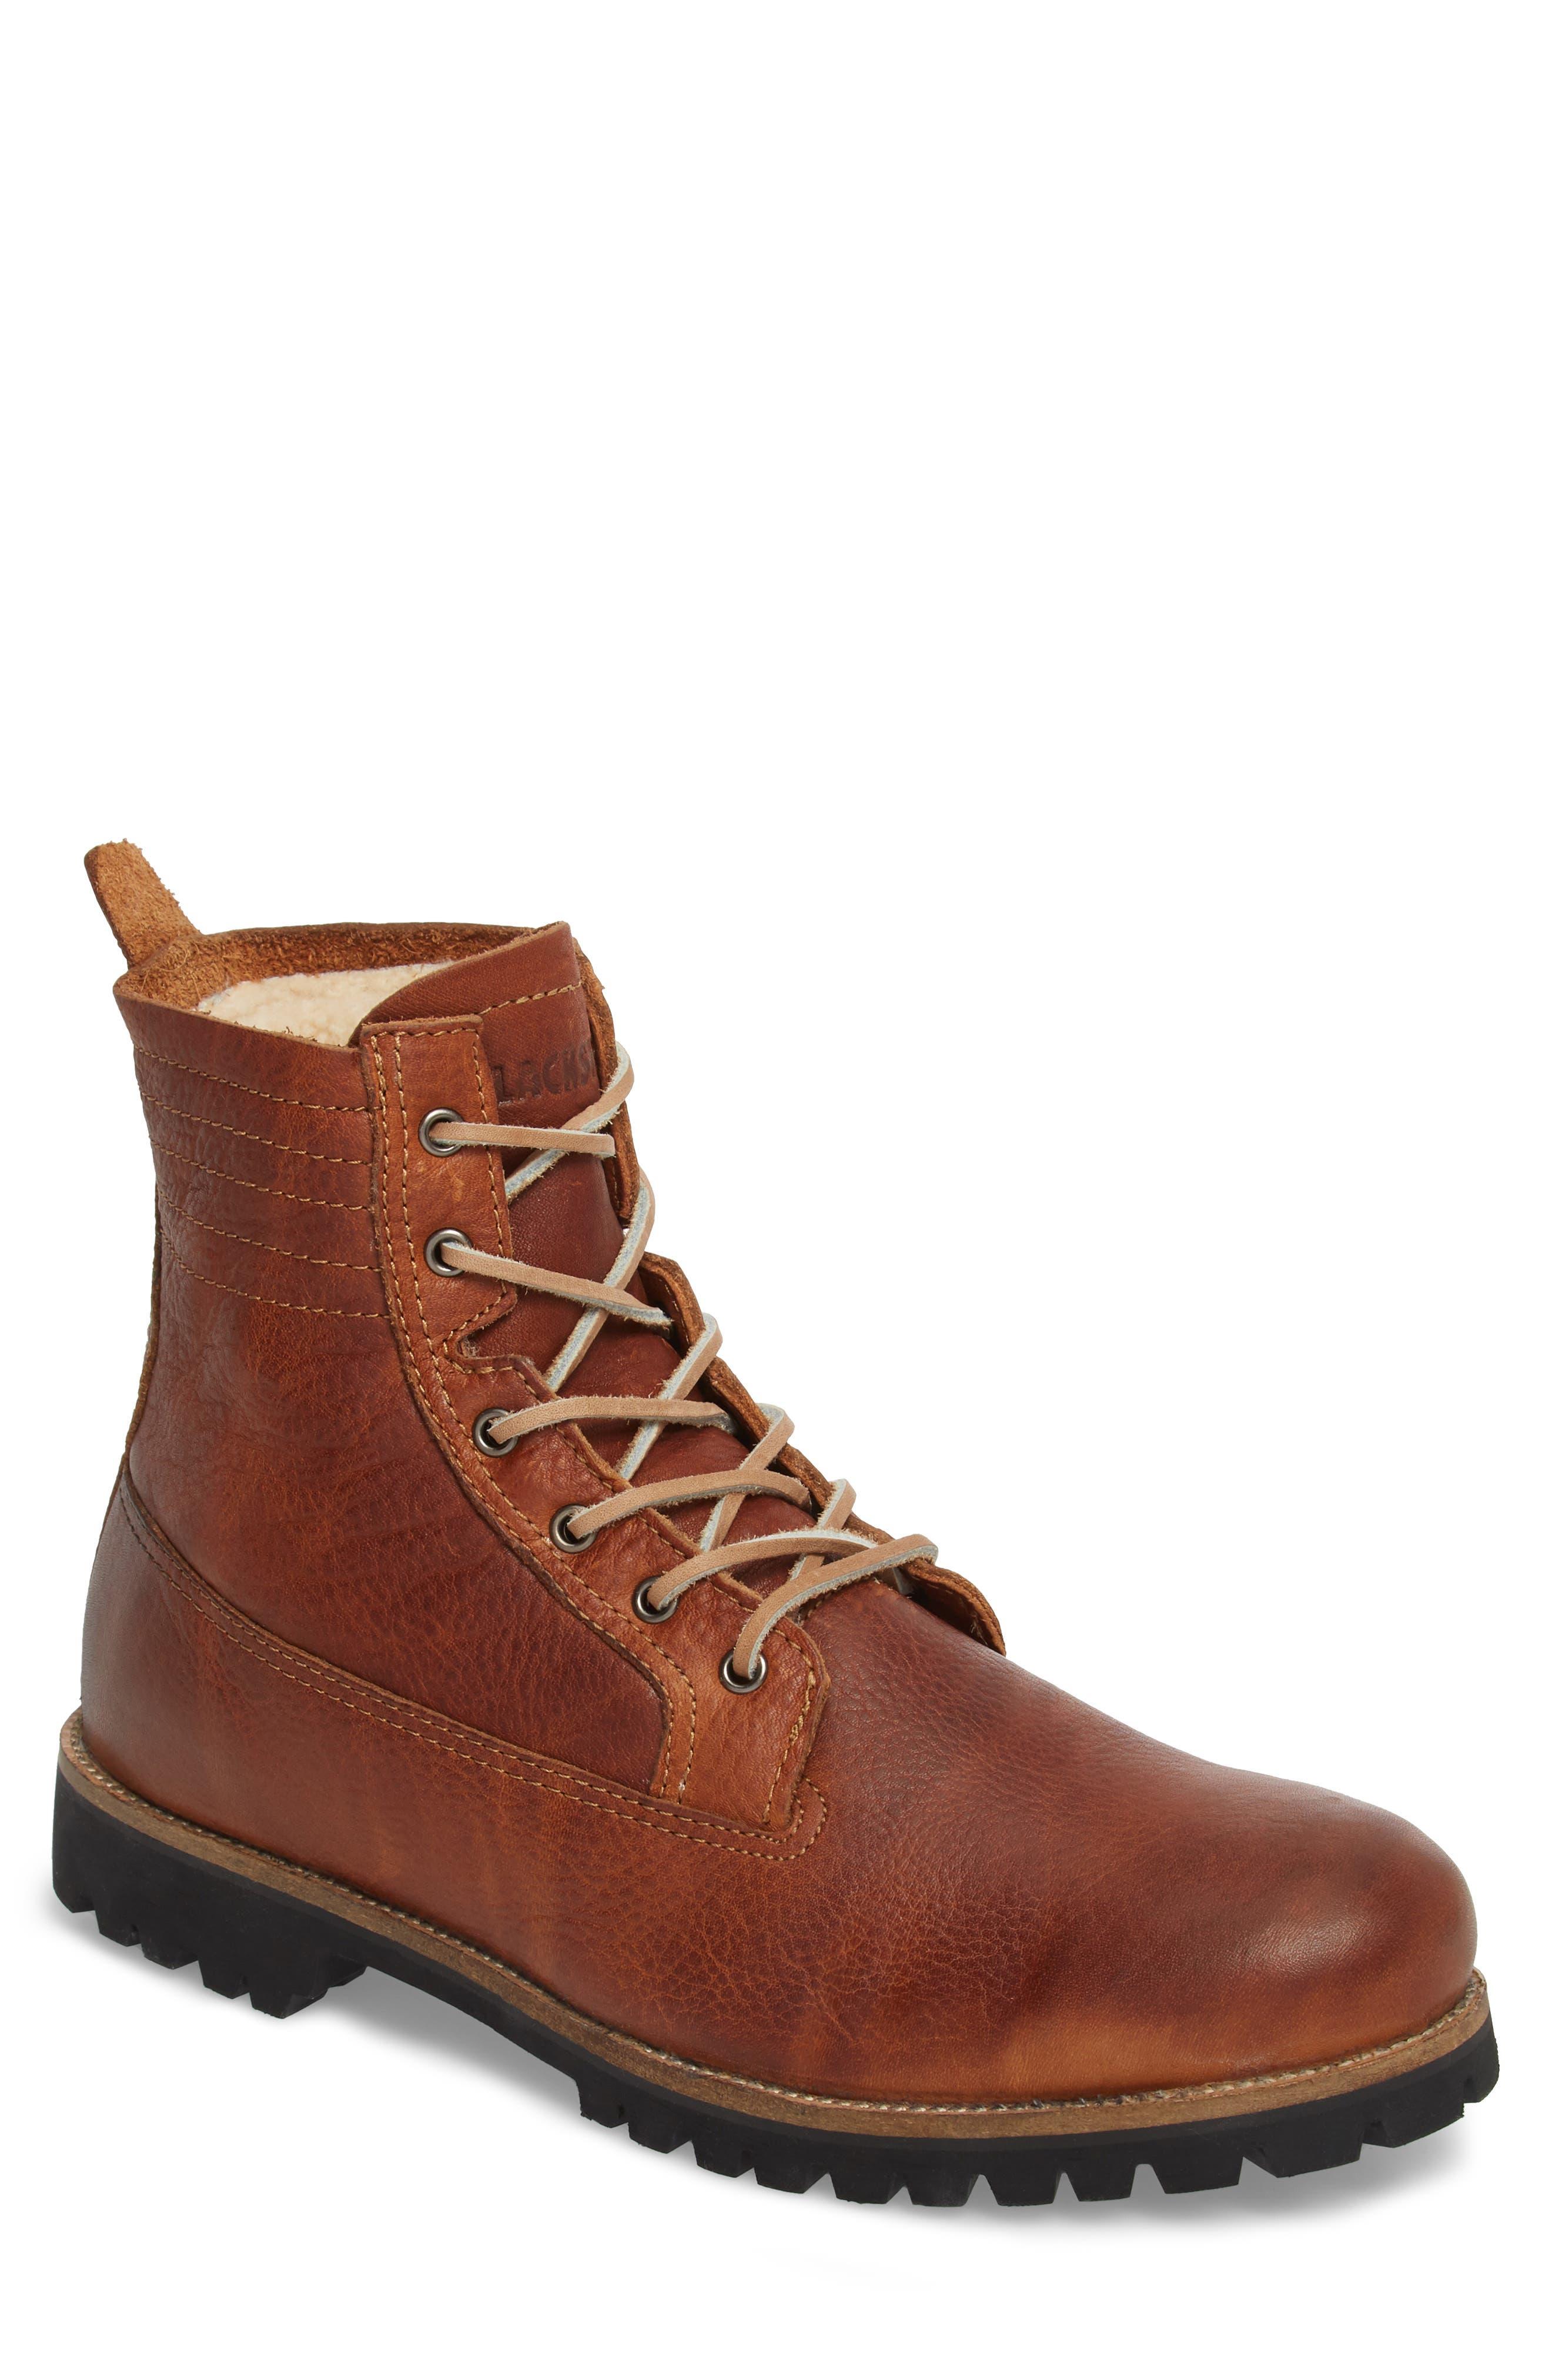 Alternate Image 1 Selected - Blackstone IM 12 Plain Toe Boot with Genuine Shearling (Men)